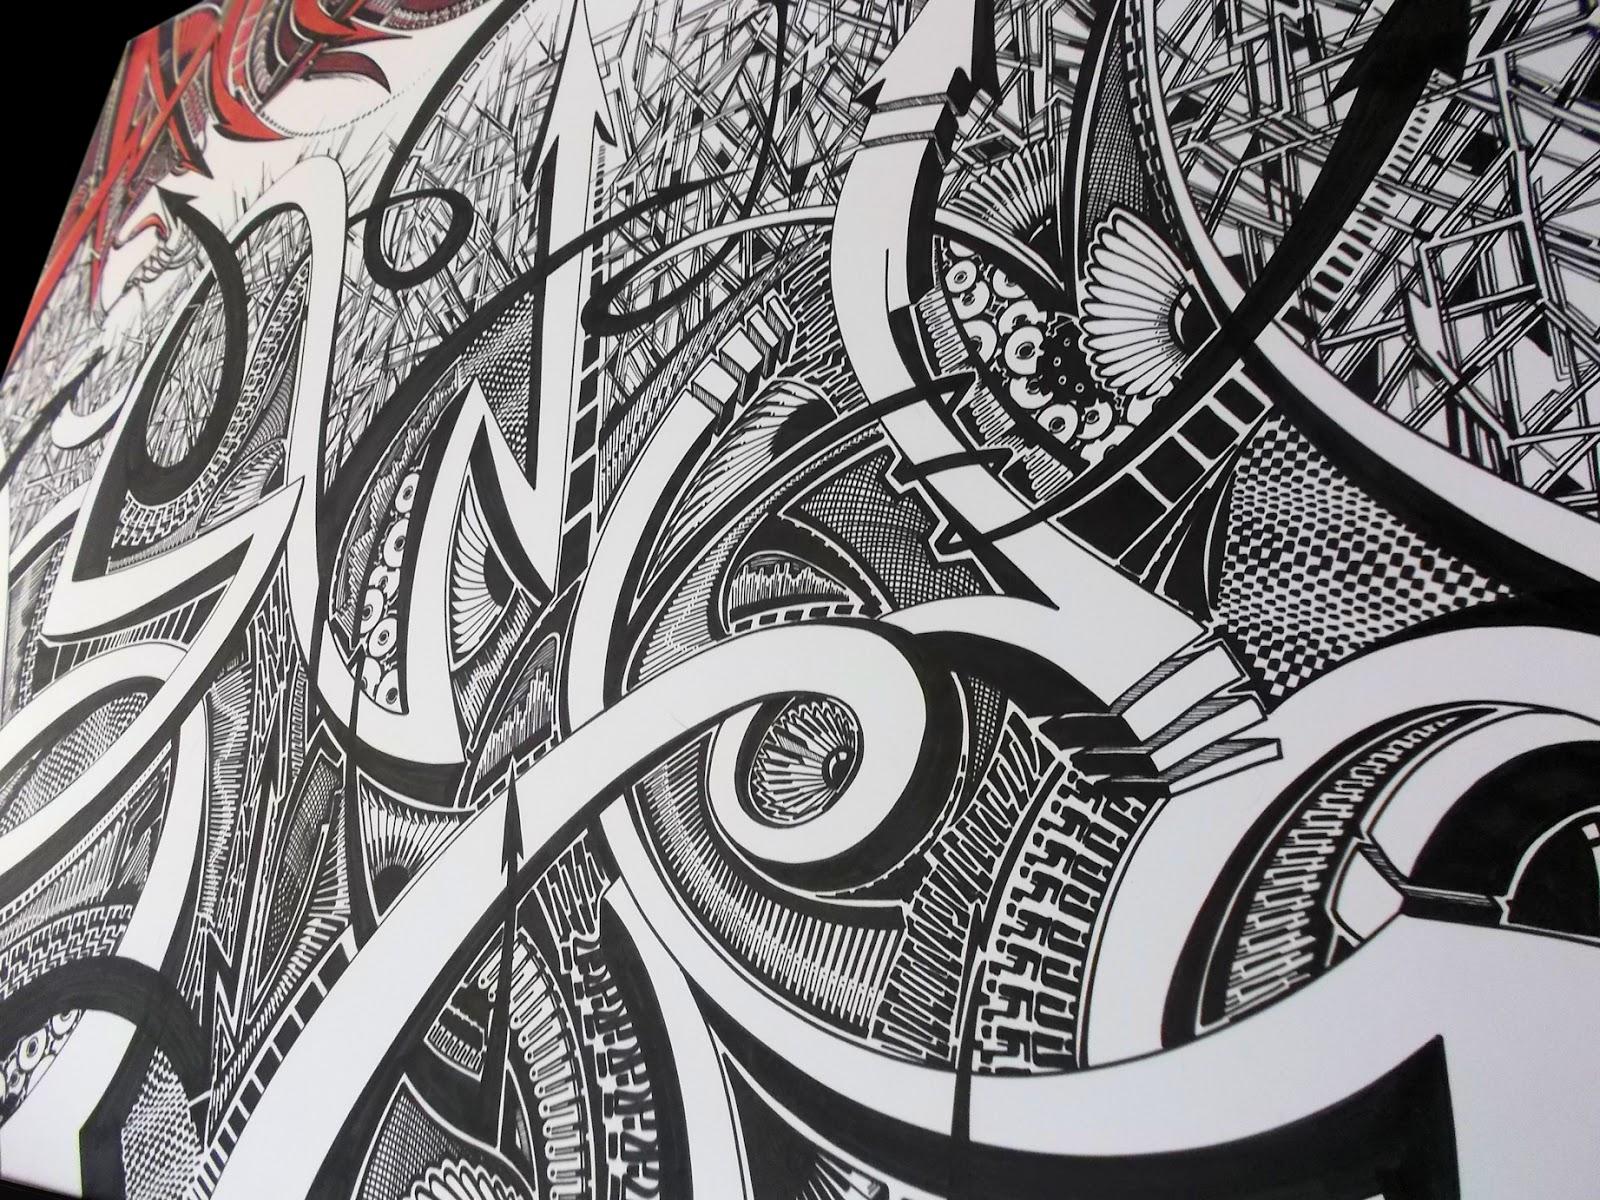 Pinstripe Chris NEW Sharpie Art Piece Finshed amp For Sale